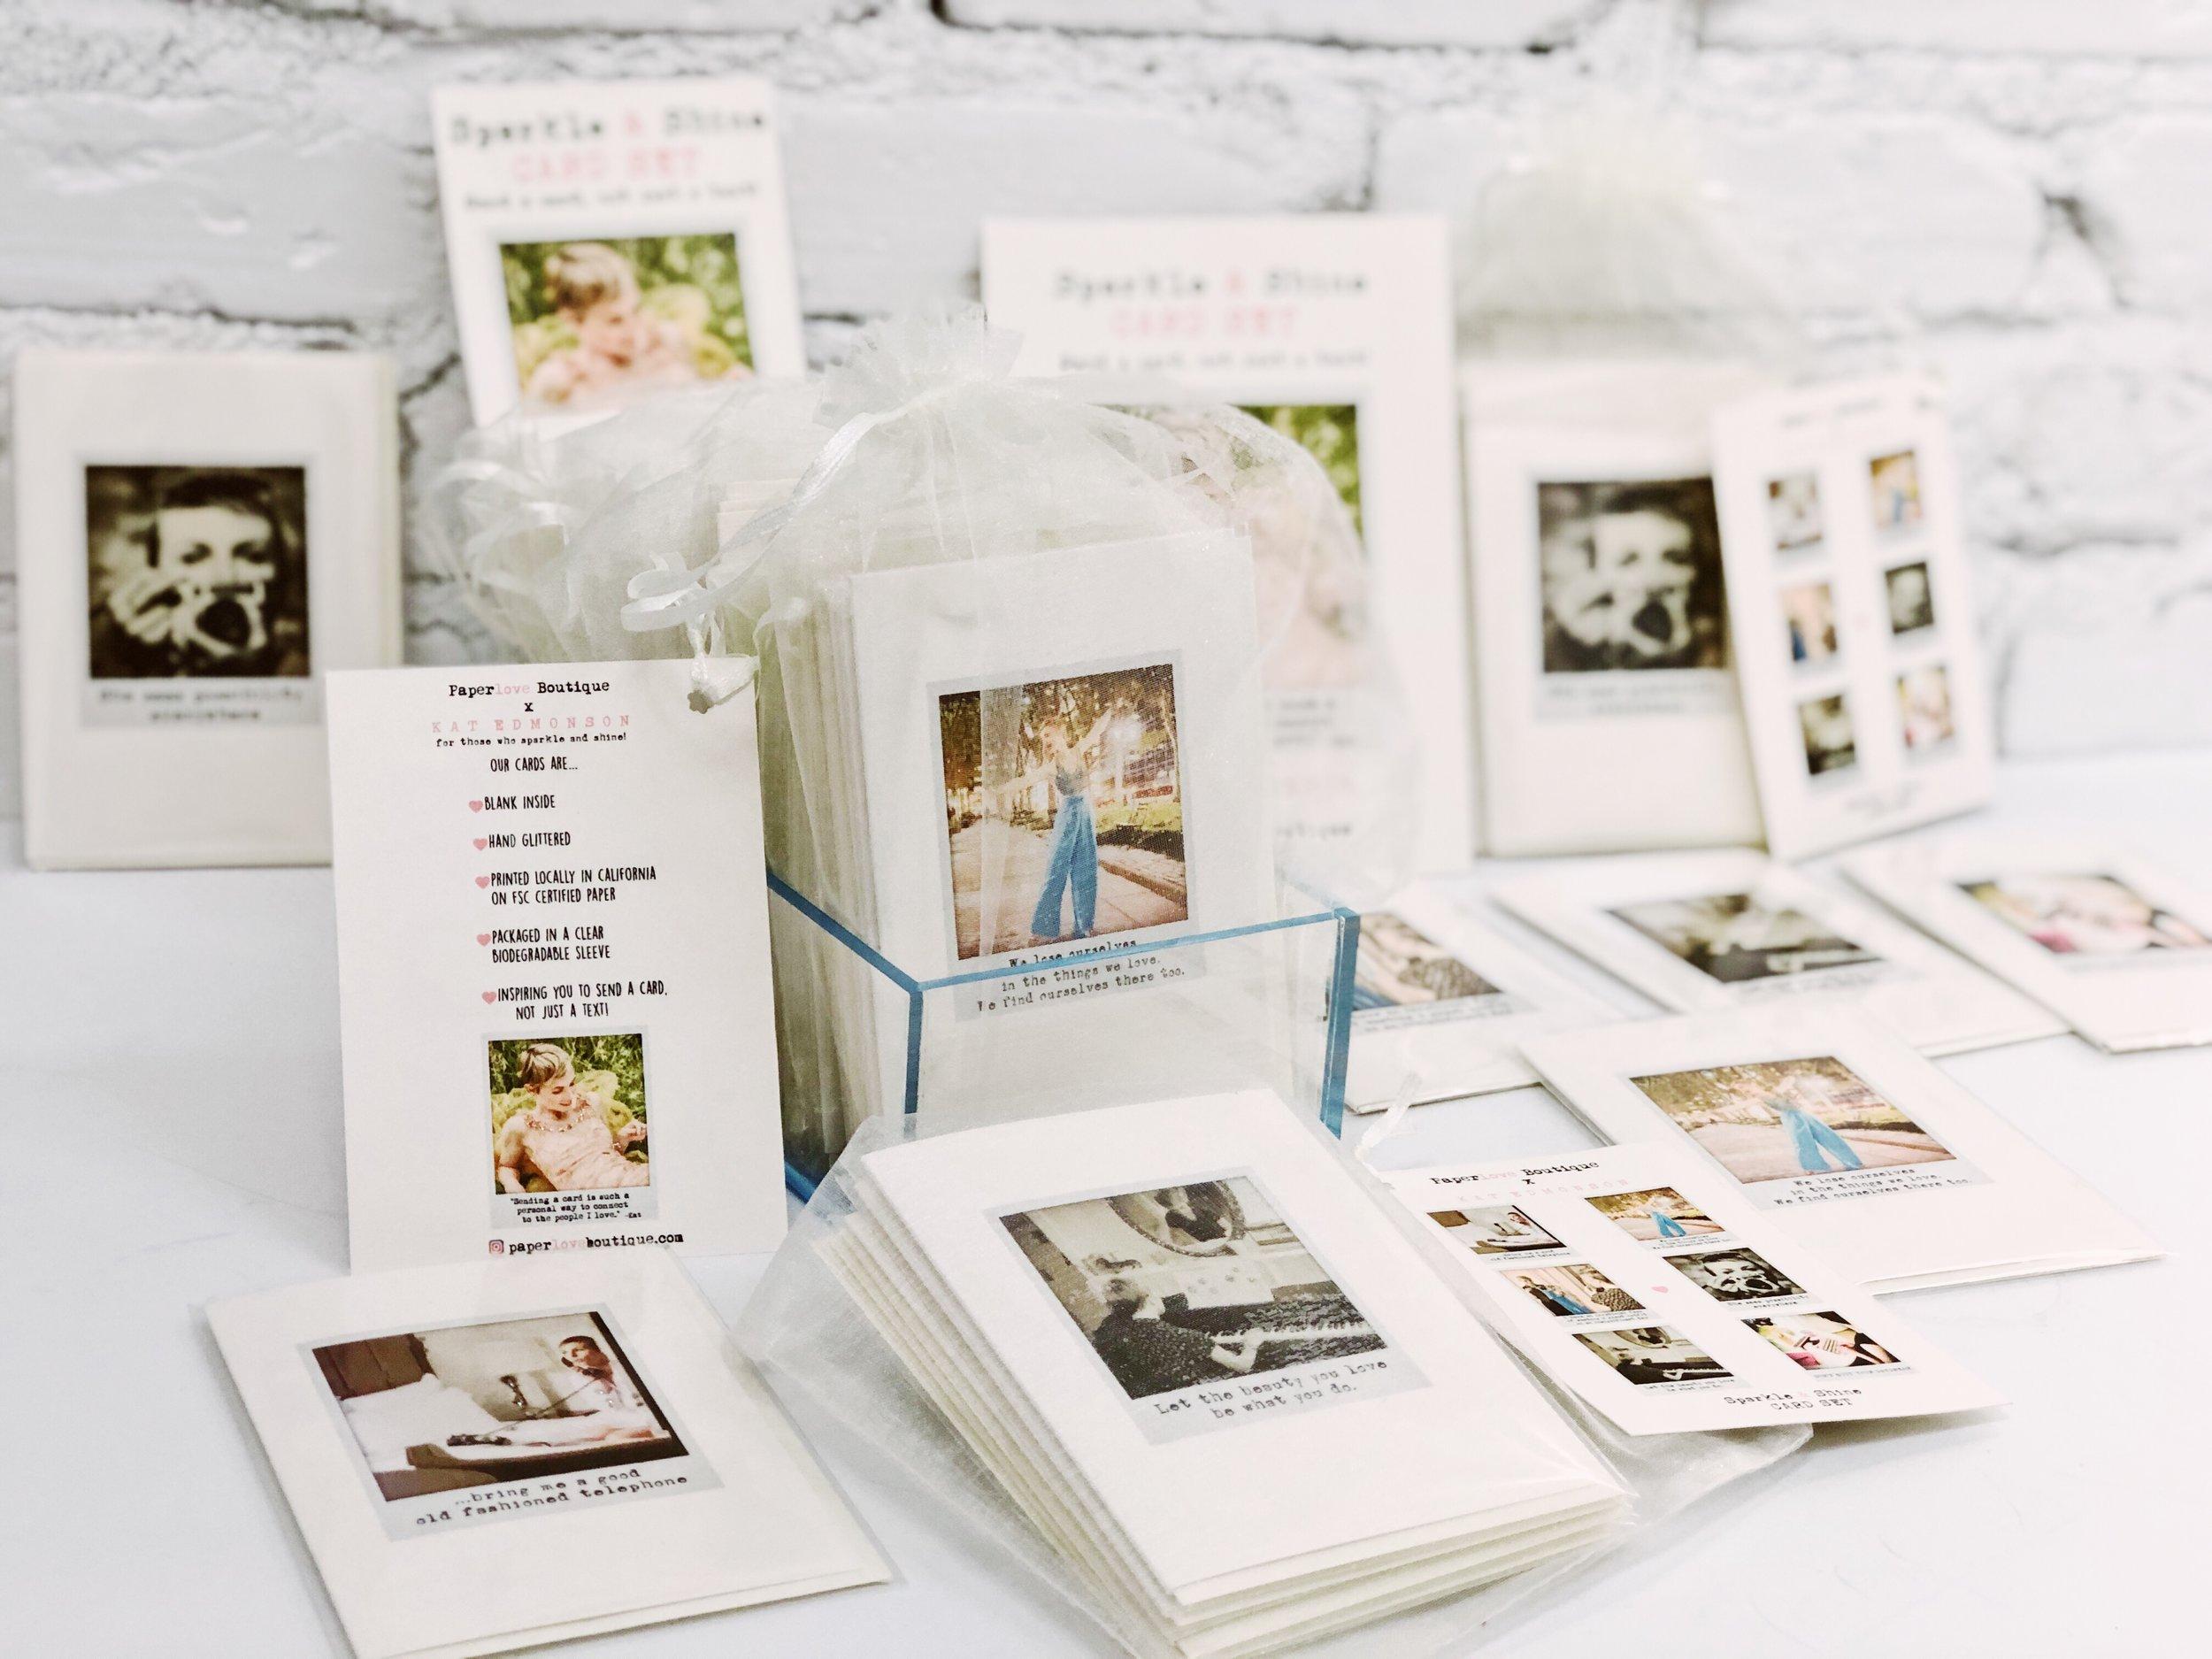 kat-edmonson-sparkle-and-shine-card-set-styled-2.JPG